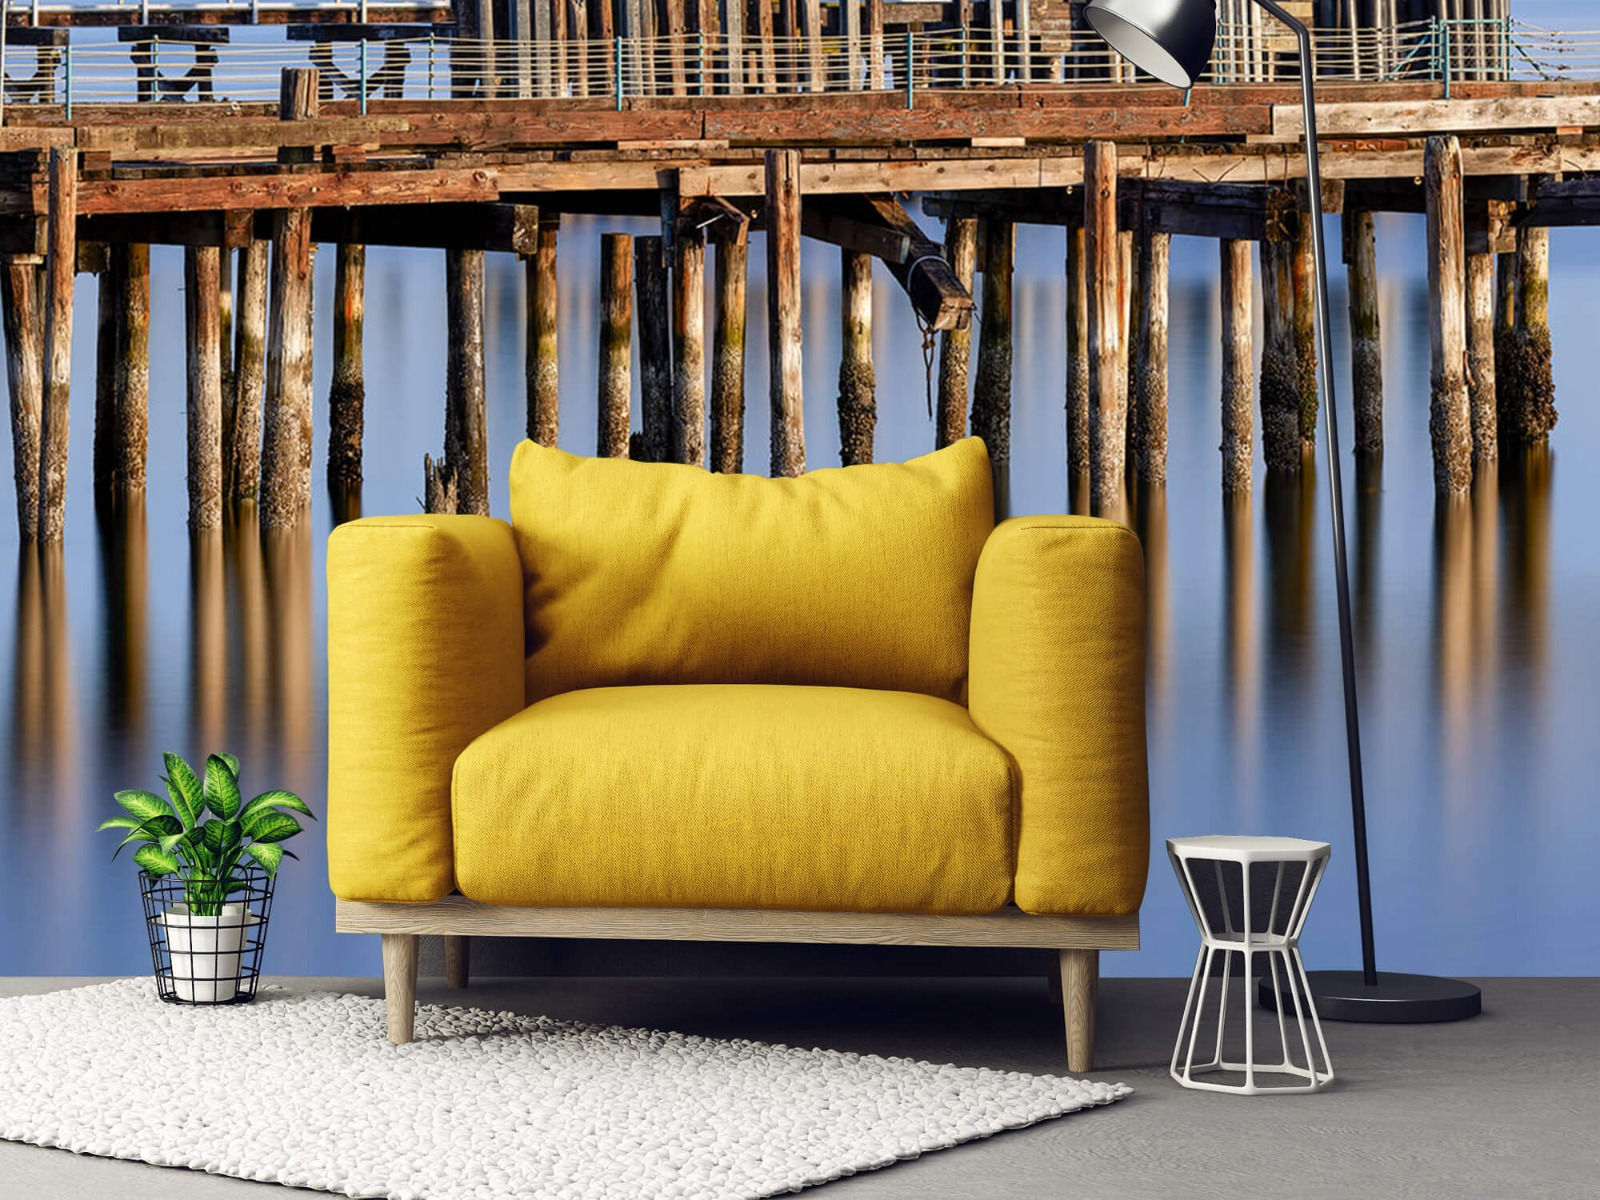 Houten Steigers - Steiger op houten palen - Wallexclusive - Slaapkamer 21